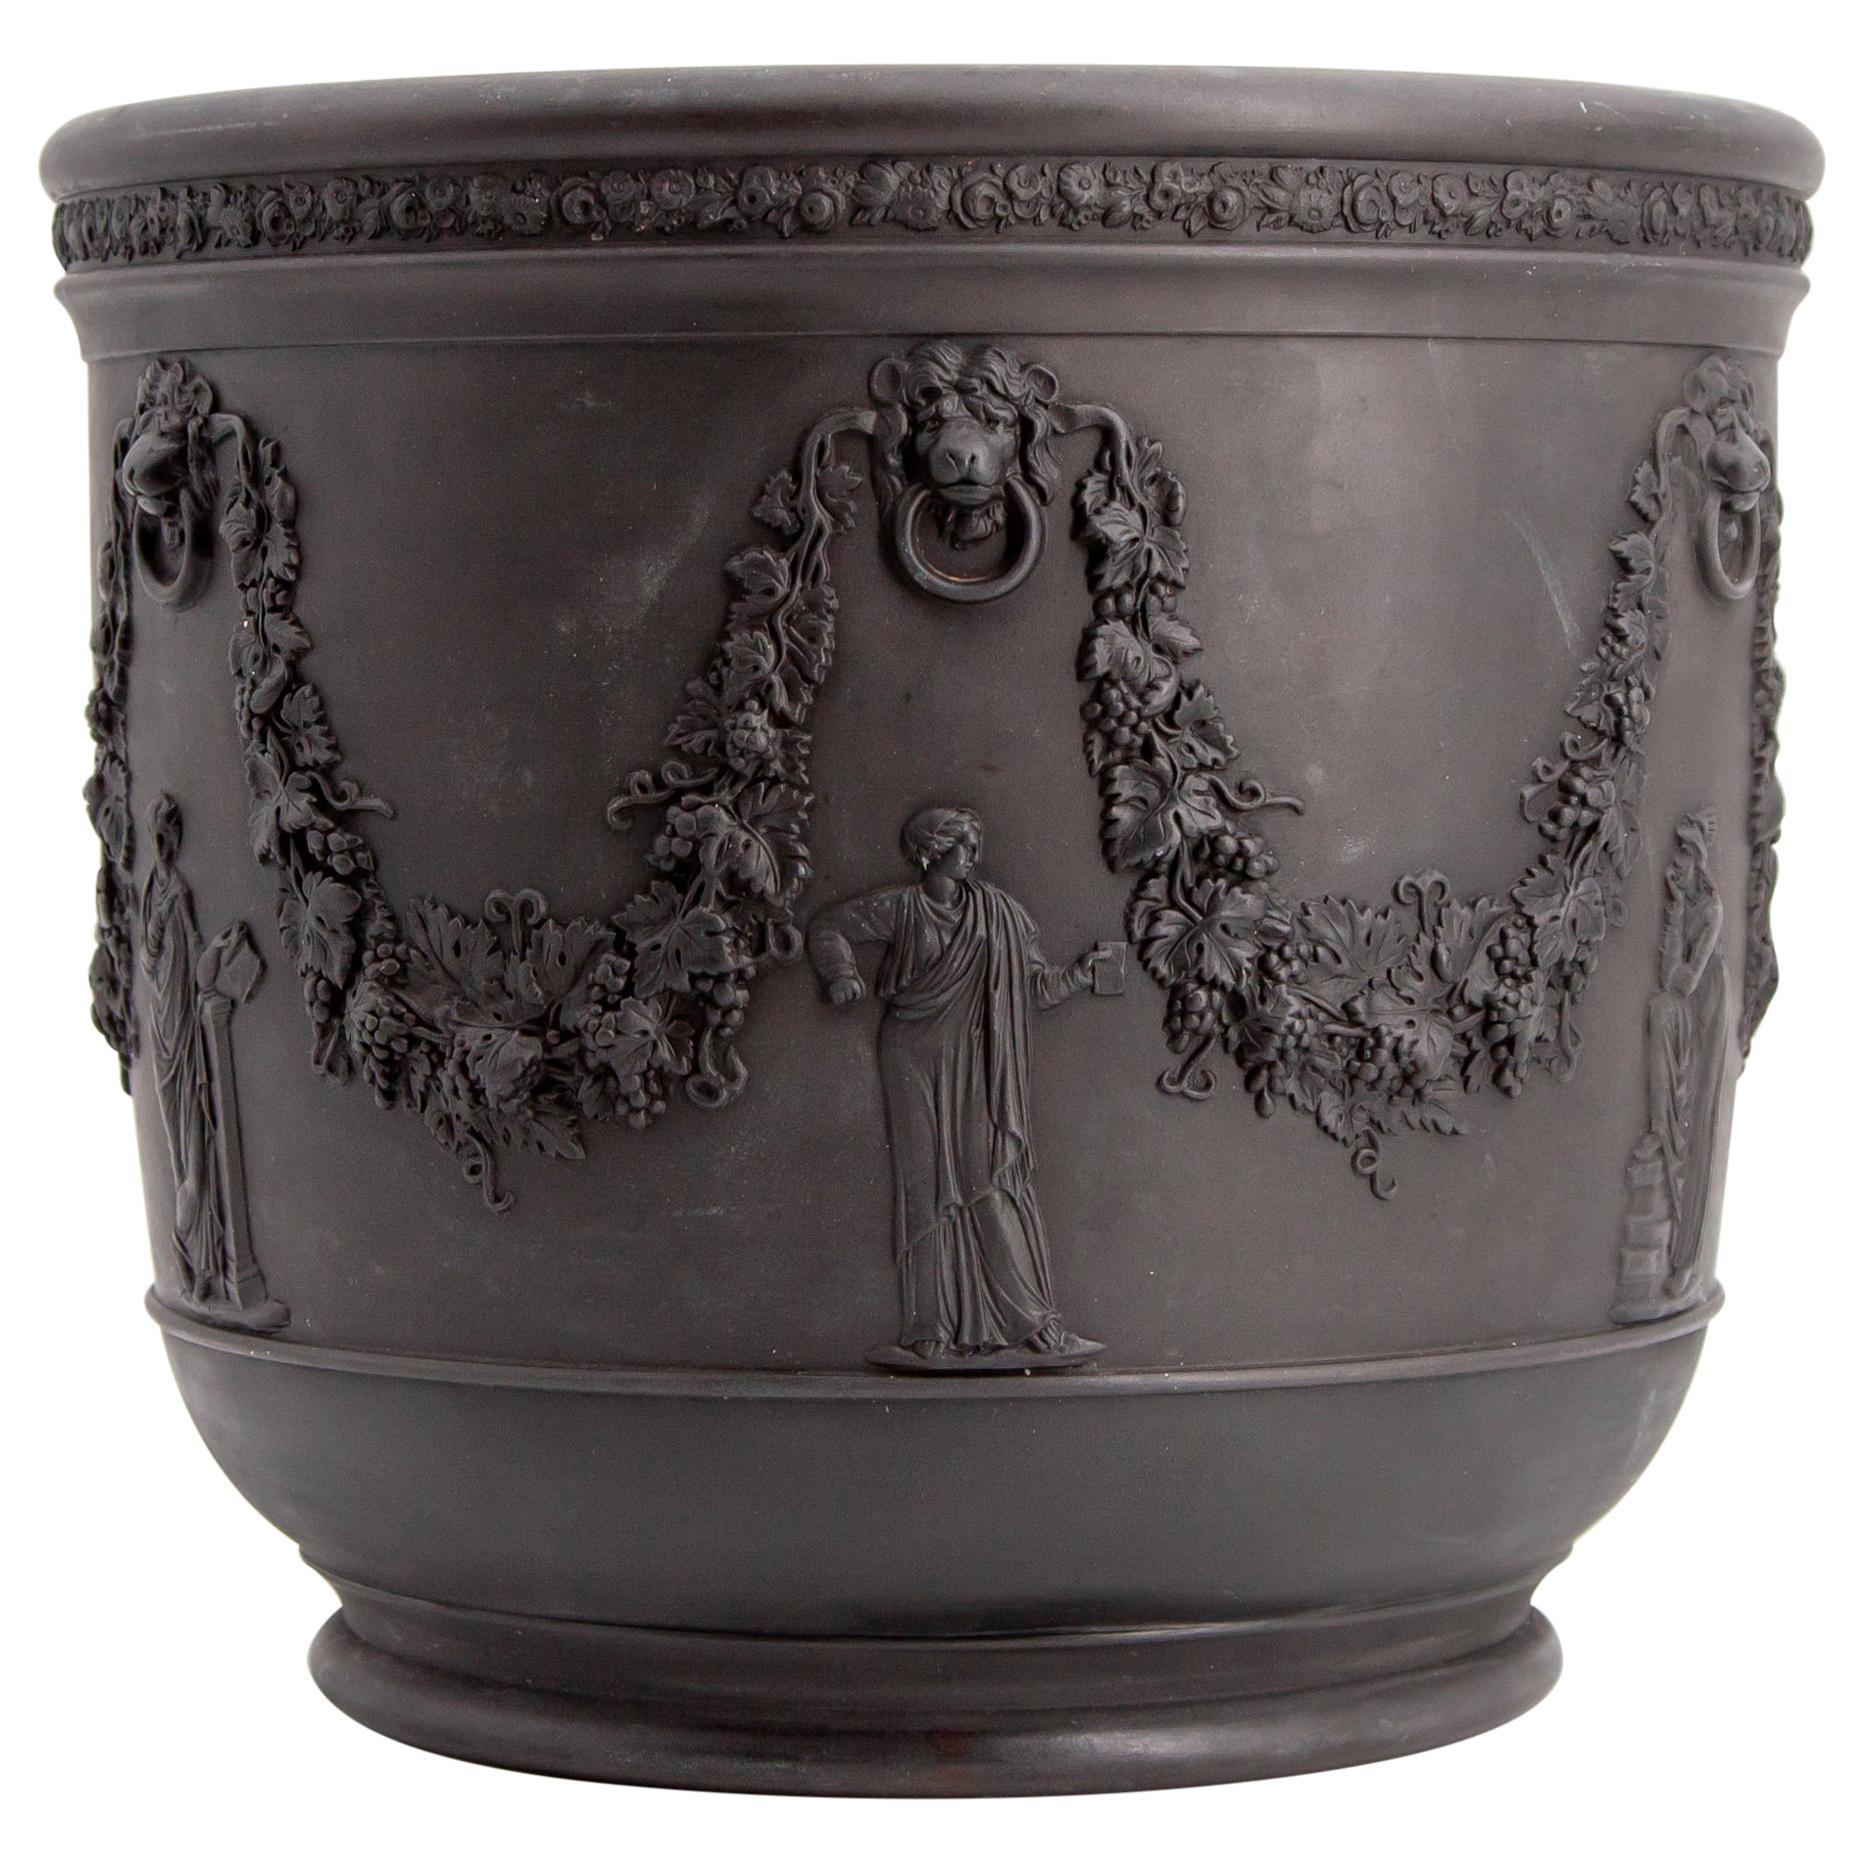 Early 19th Century Wedgwood Black Basalt Jardiniere Cachepot